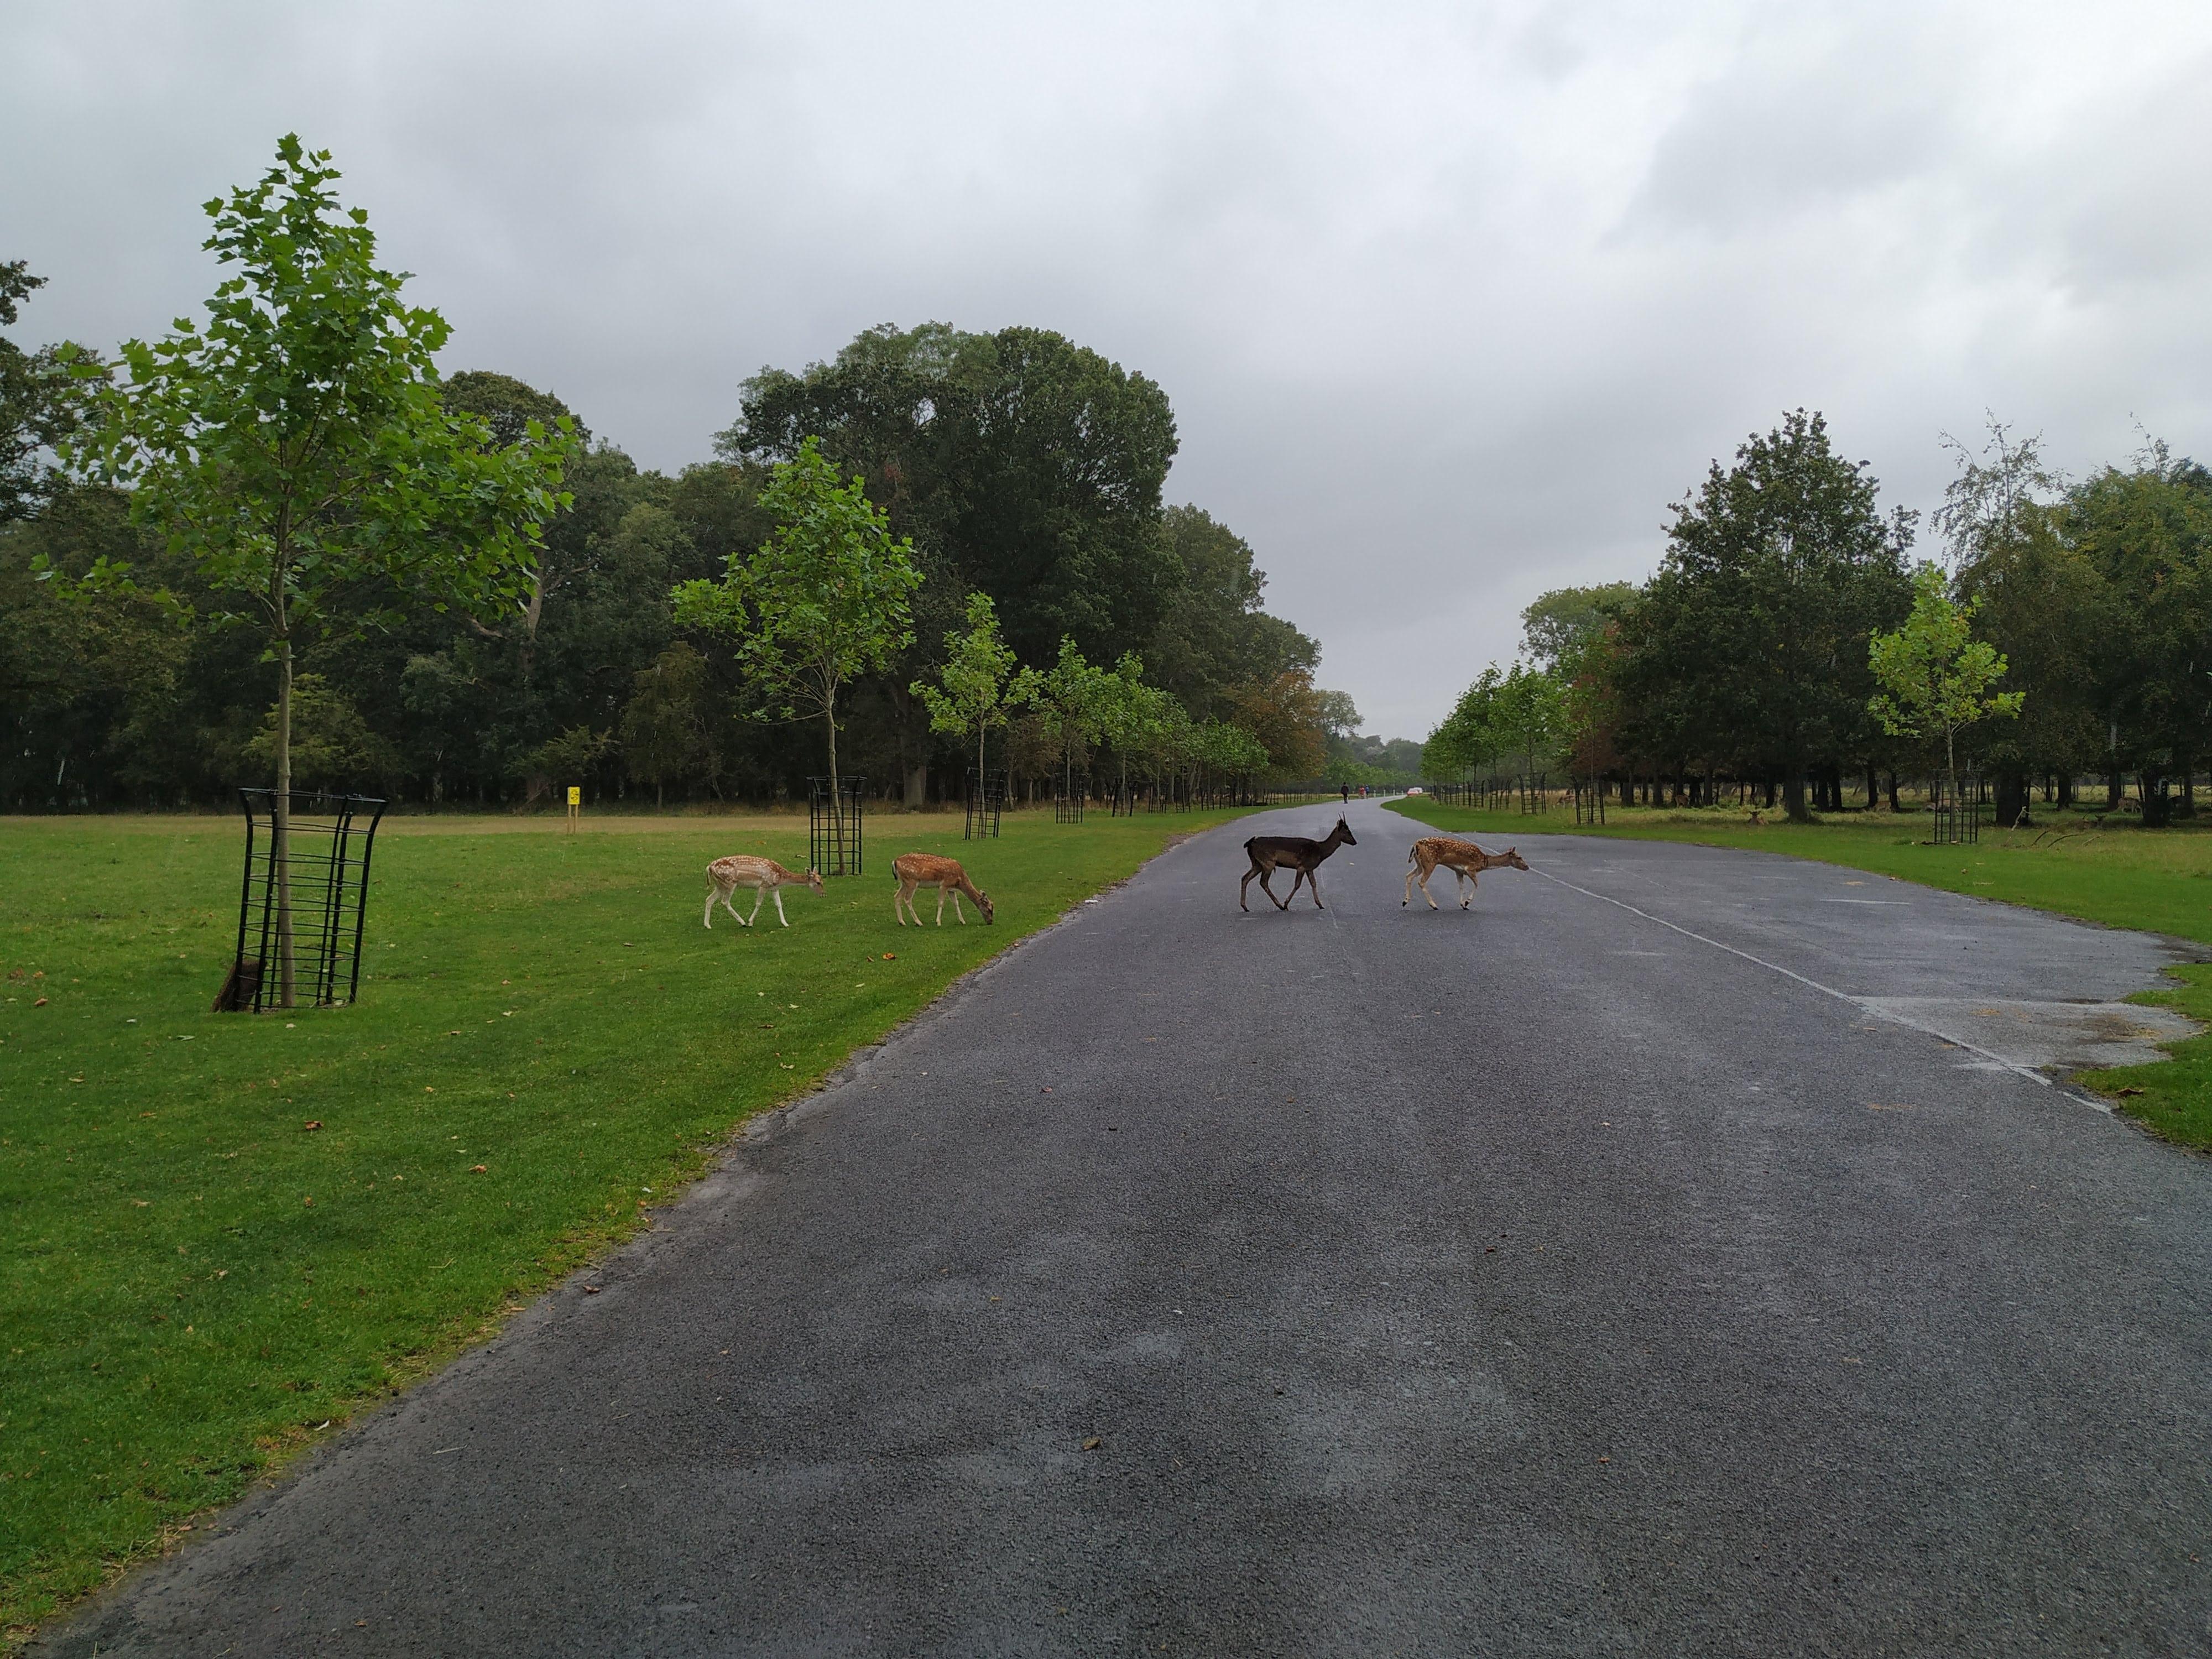 Phoenix Park Dublín. Ciervos en libertad.